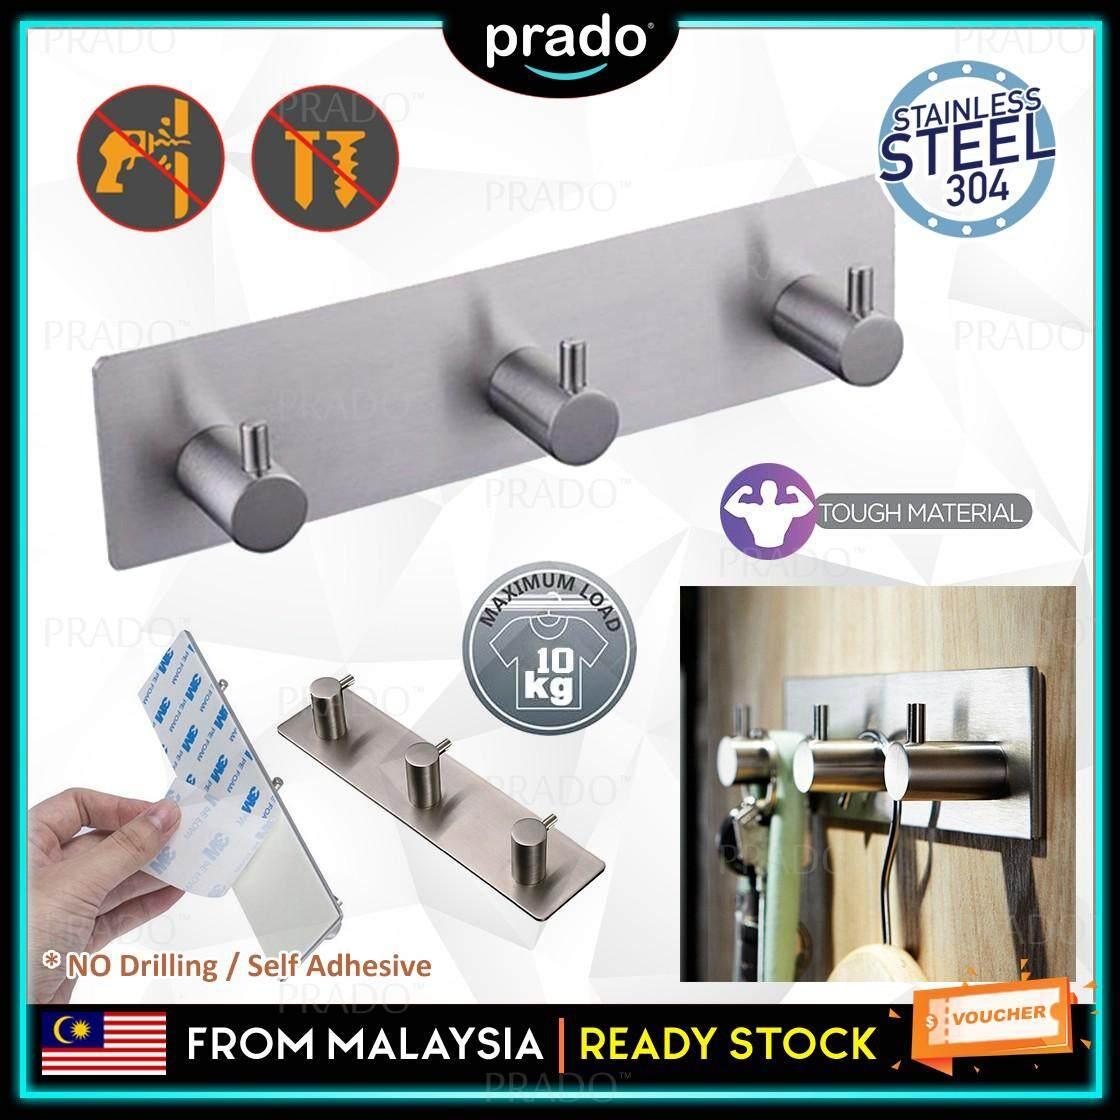 PRADO Malaysia No-Drill 3M Self Adhesive Strong Hook 304 Stainless Steel Key Rack 3-Hook Rail Hotel Kitchen Bathroom Storage Organizer Wall Mount Hangers